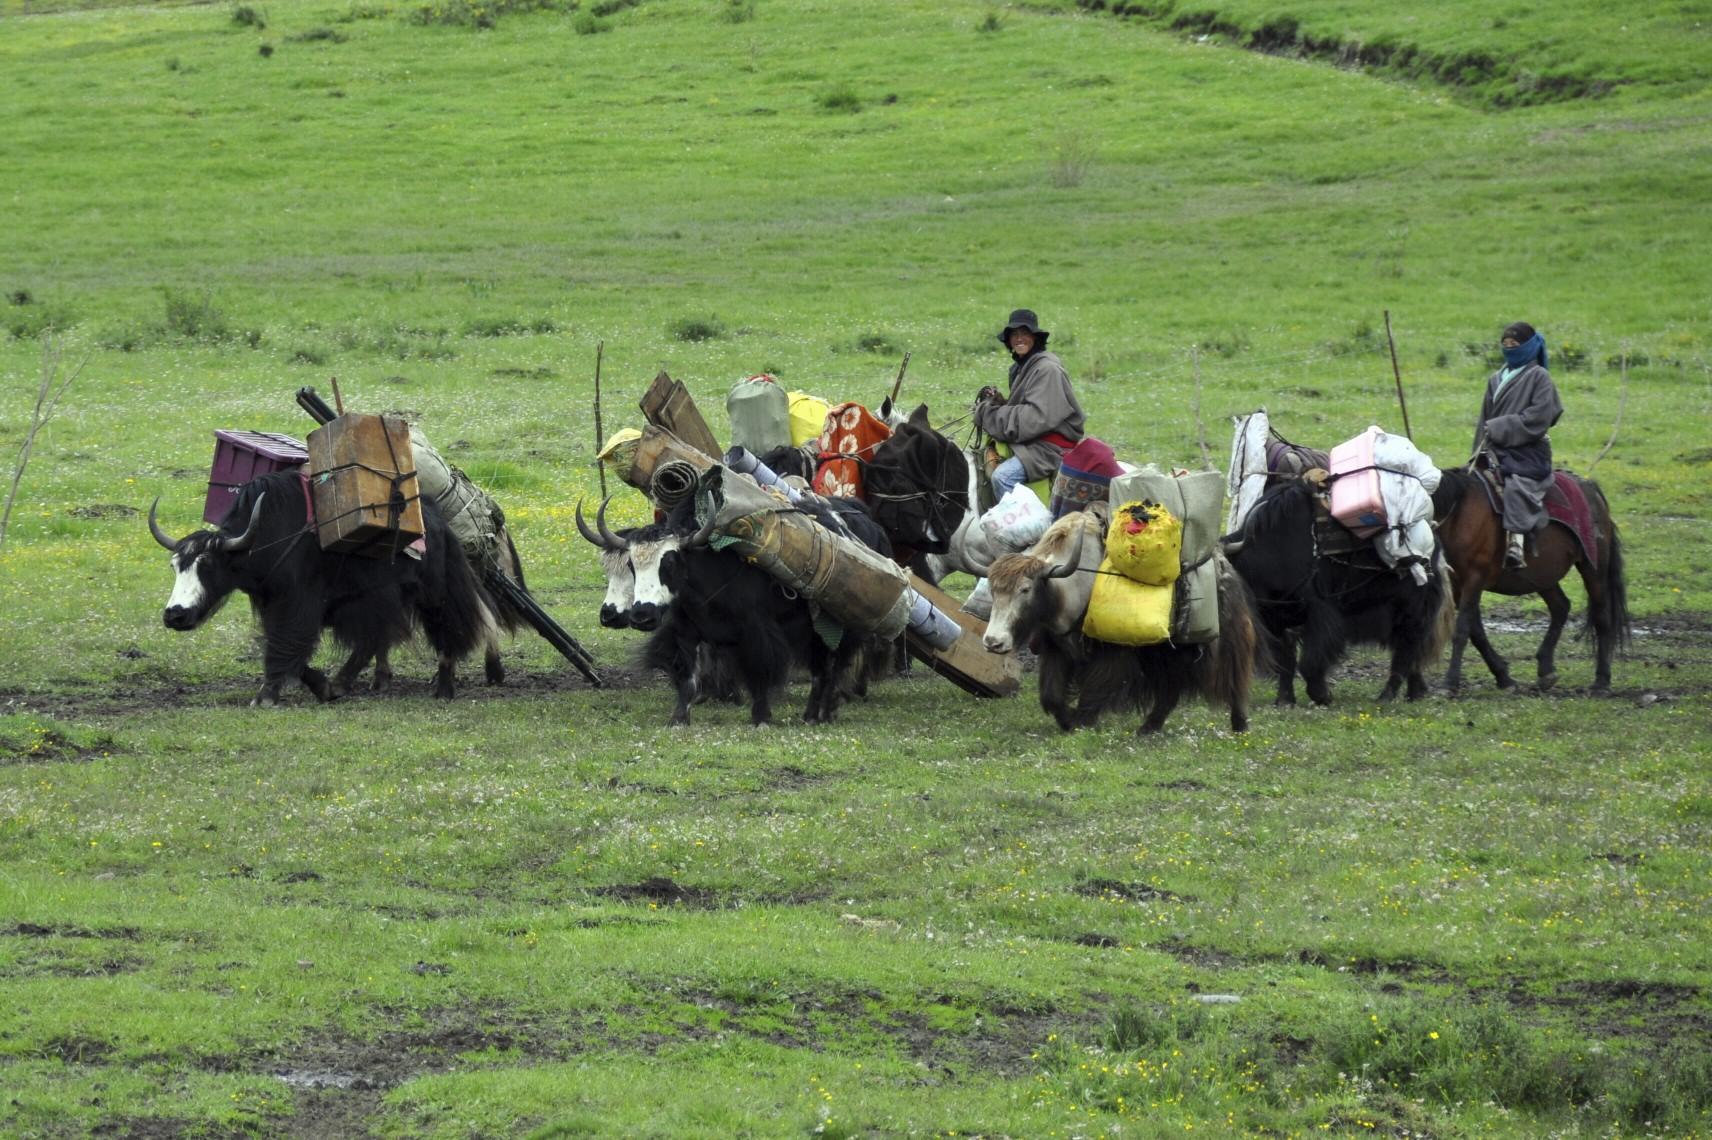 The Life at Tibetan Plateau